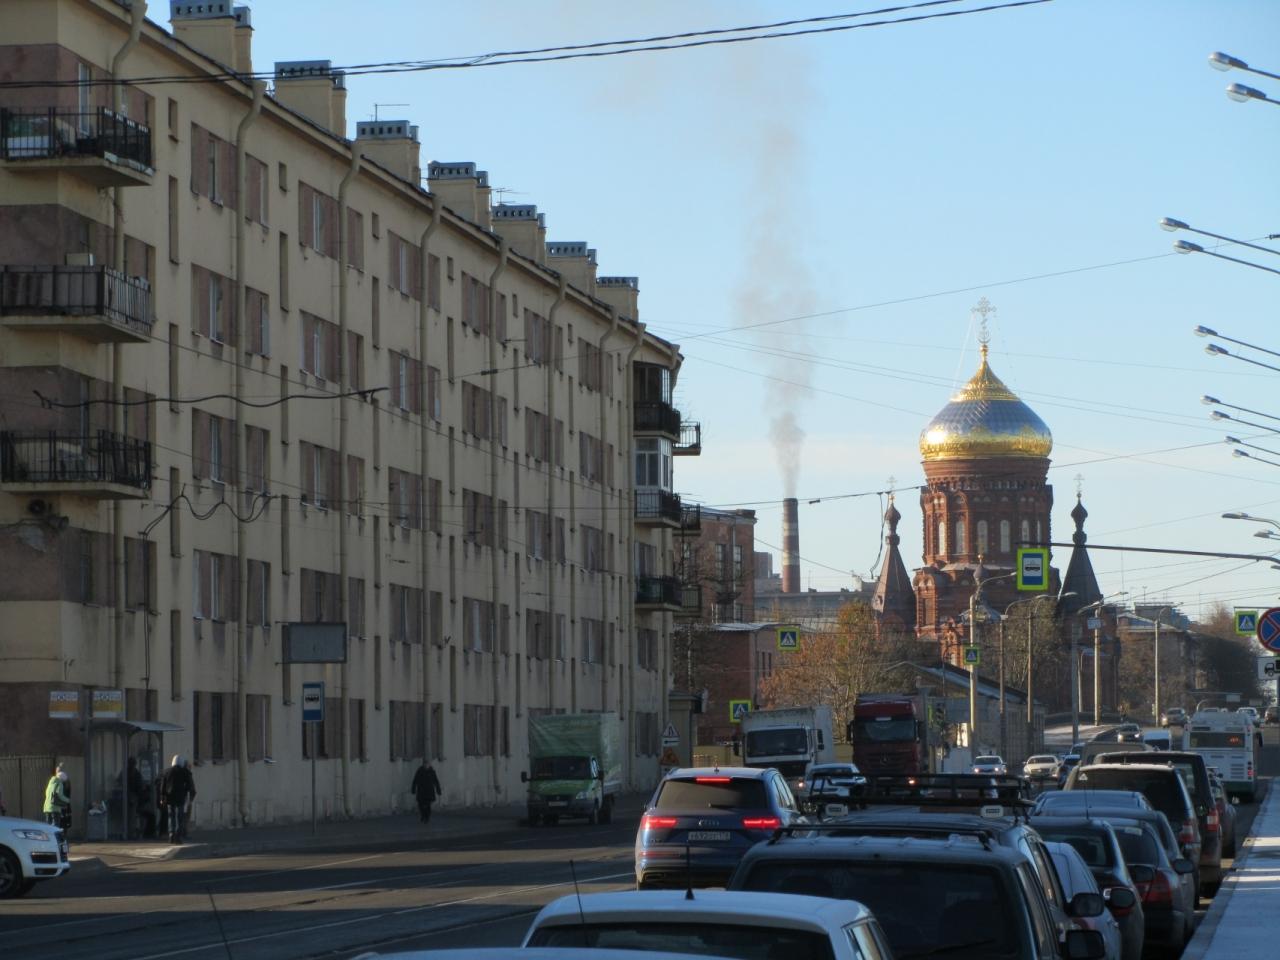 http://alt.pro.bkn.ru/images/s_big/39d6b3ef-d396-11e7-b300-448a5bd44c07.jpg